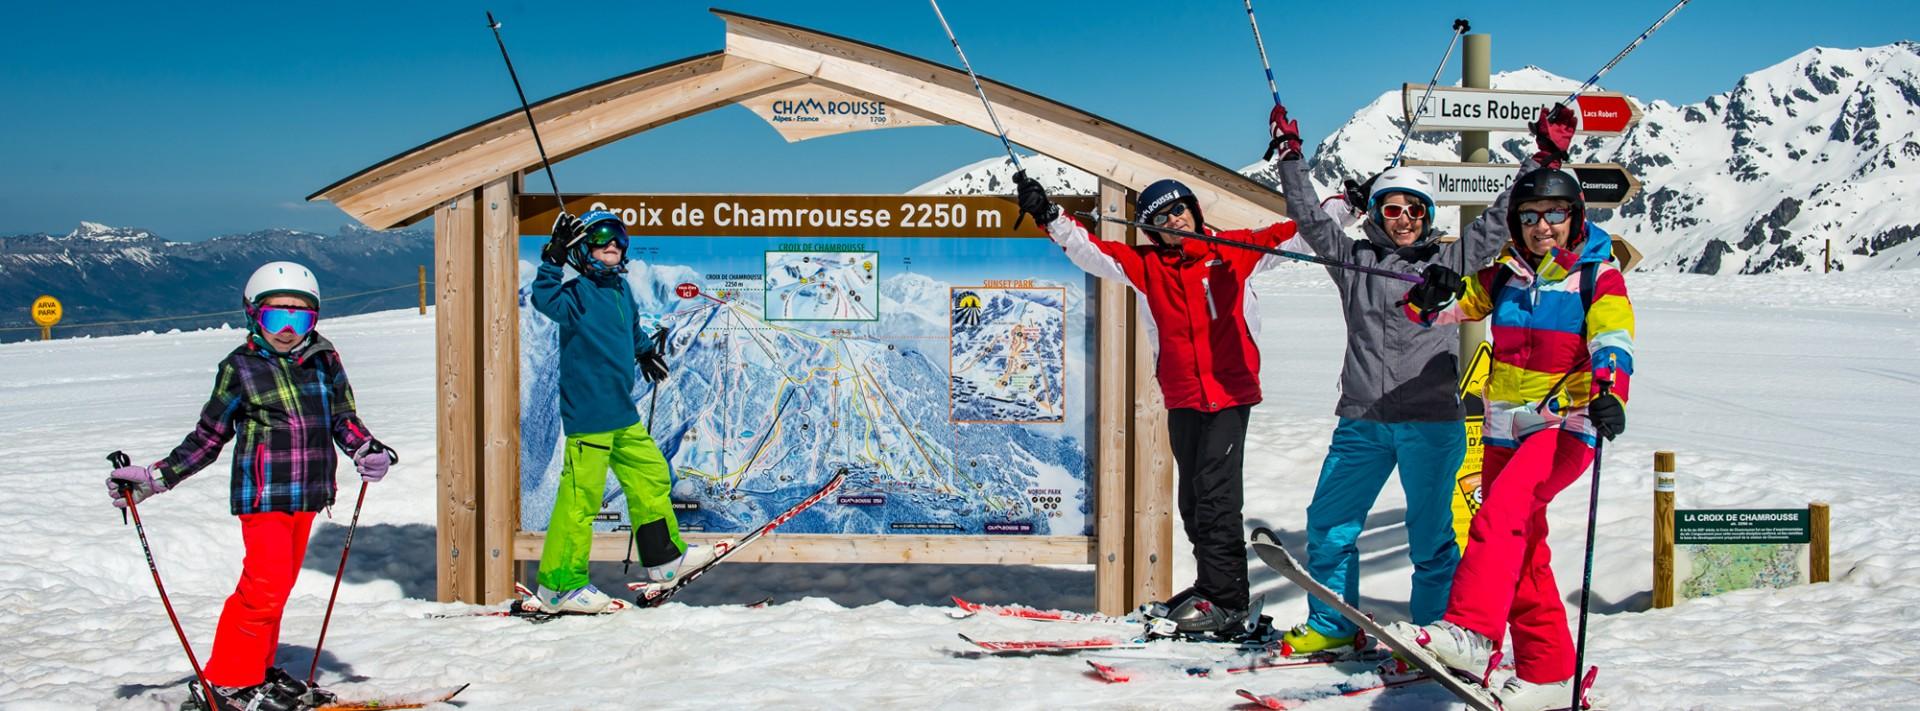 Chamrousse ski alpin famille